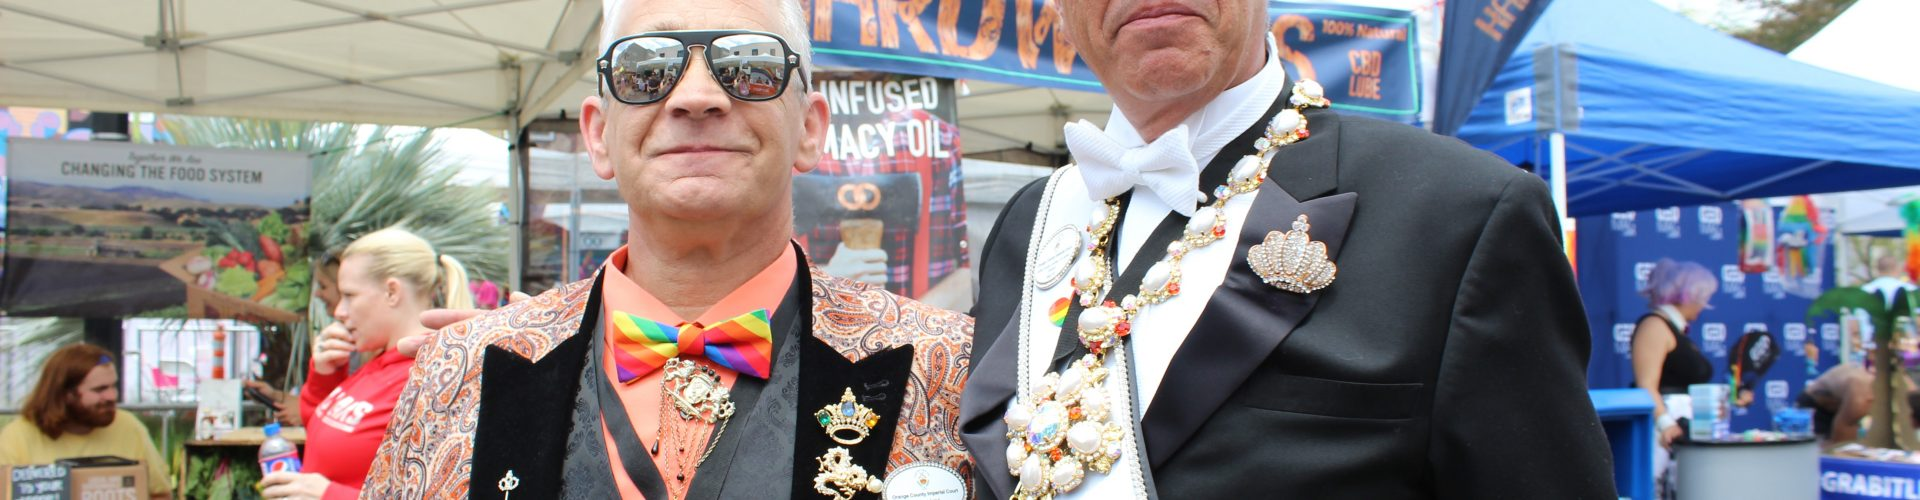 rencontre telephone gay organizations à Castres